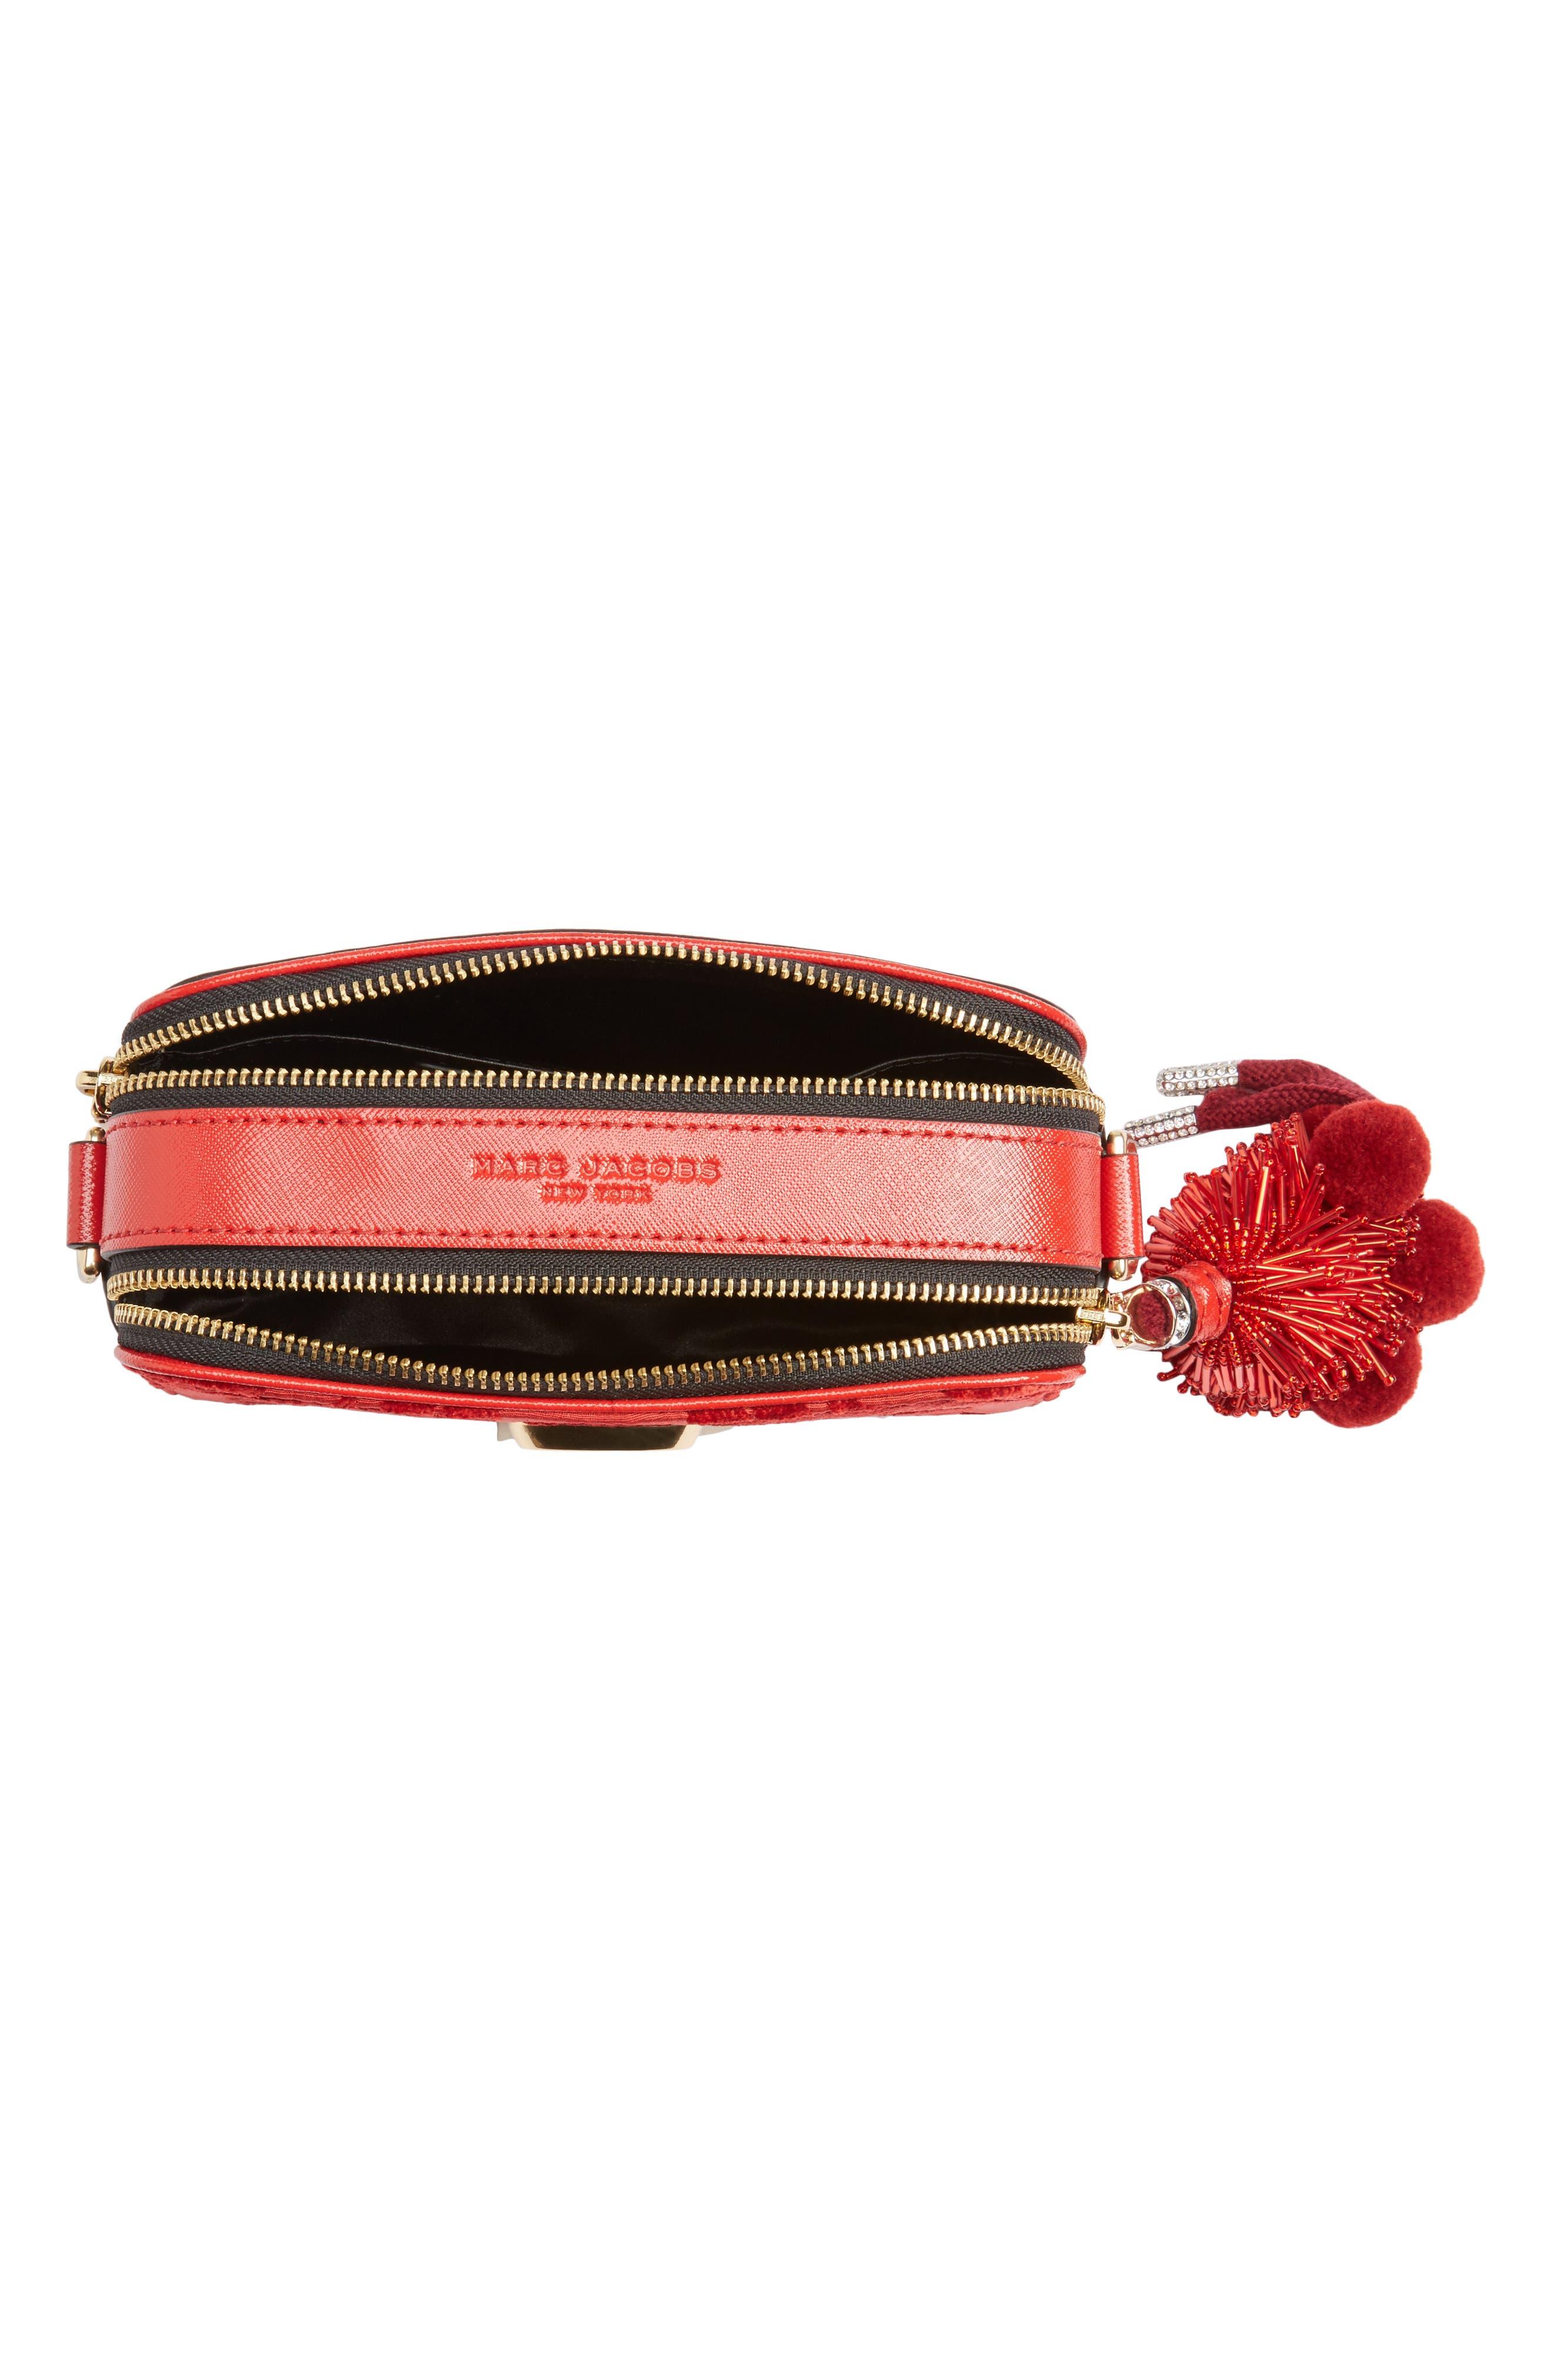 Snapshot Jacquard Crossbody Bag,                             Alternate thumbnail 4, color,                             RED